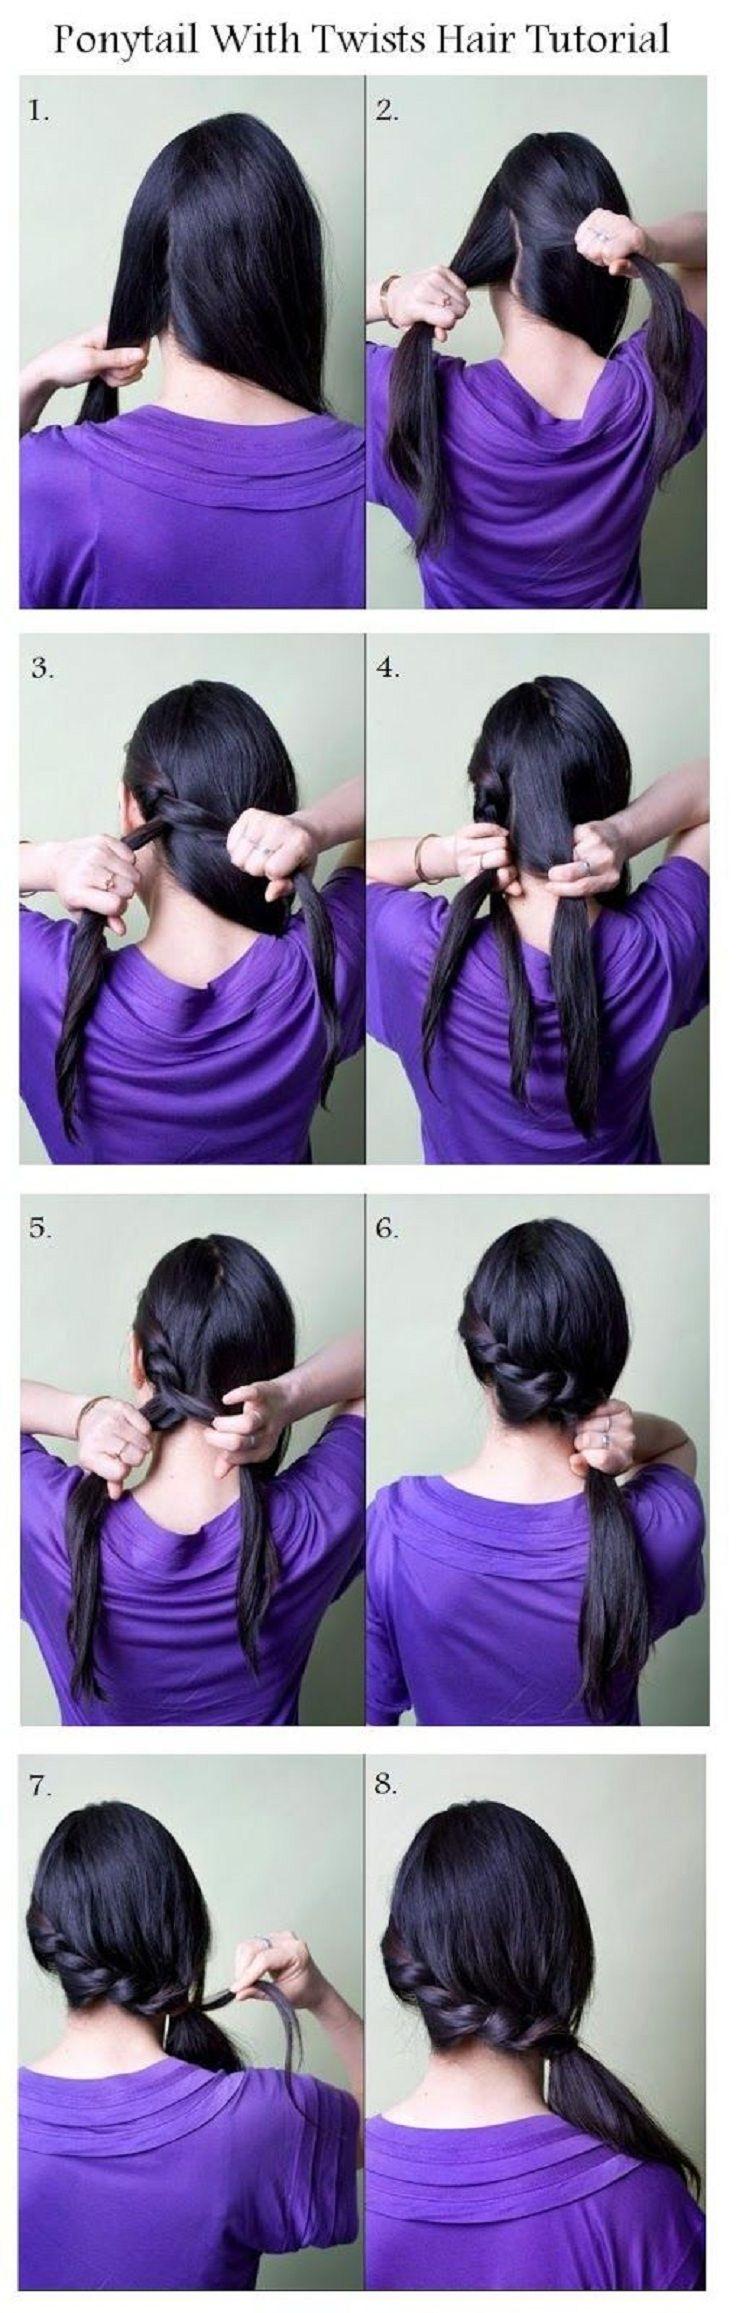 Hair Tutorials Braided Hairstyles For The Week Pretty Designs